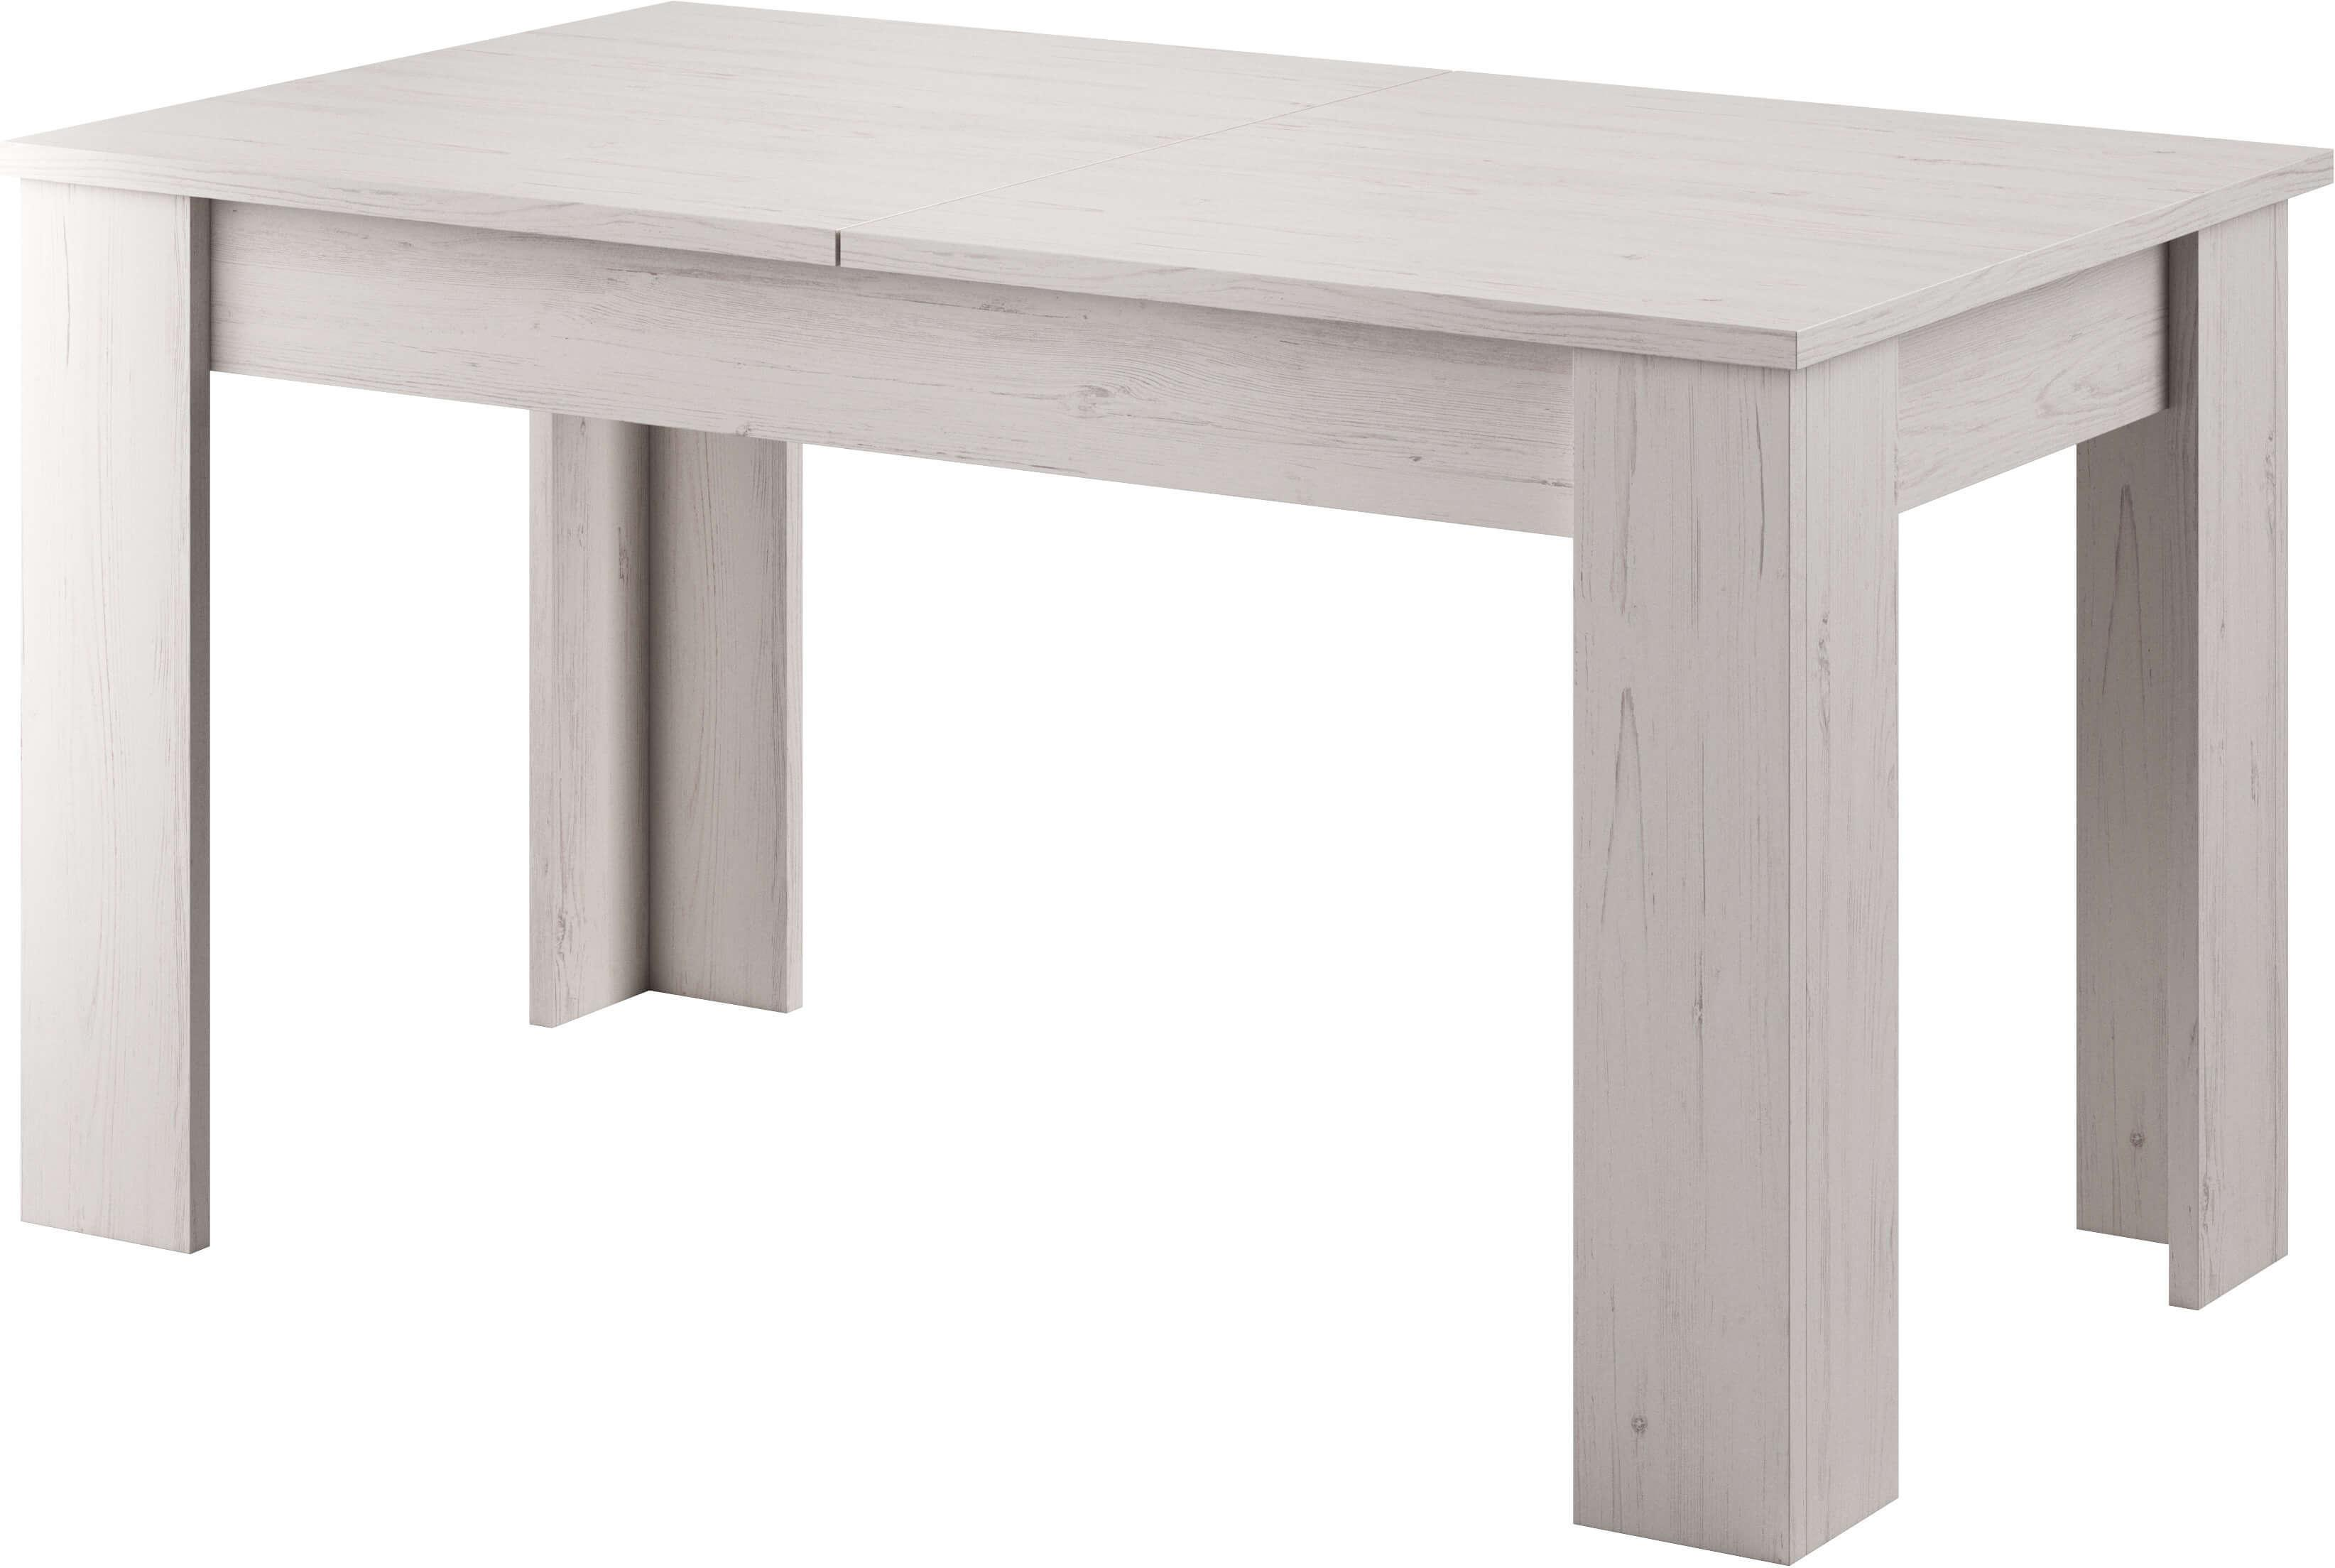 PM Jedálenský stôl Geri